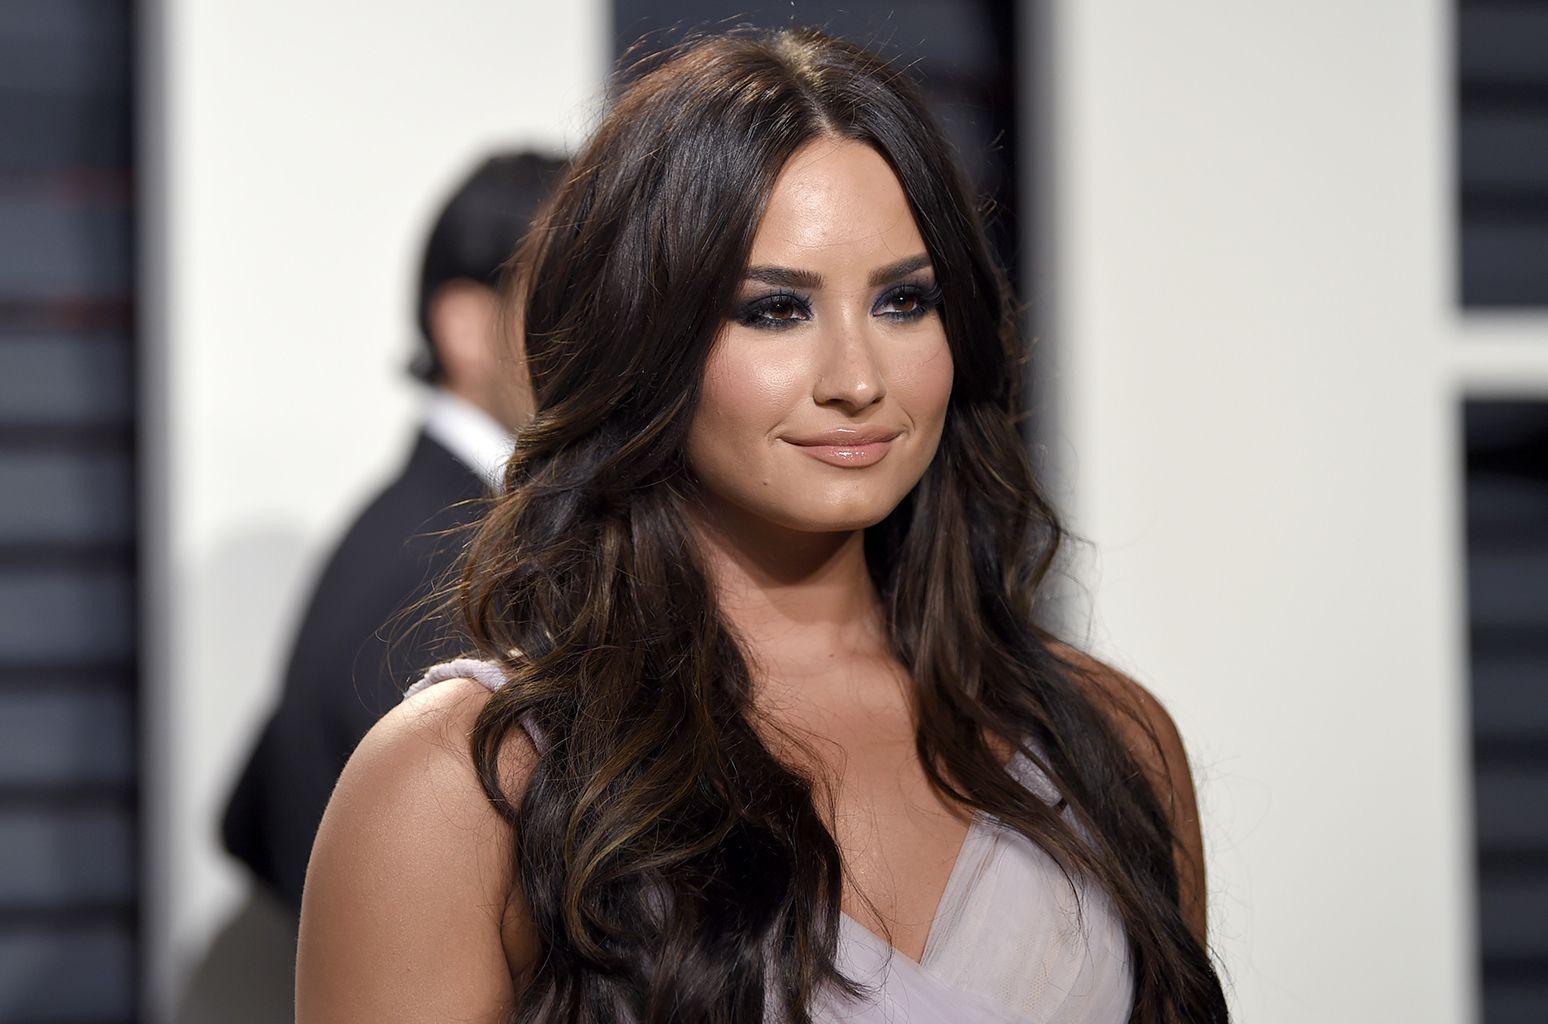 Demi Lovato Used Selena Gomez Lyrics As An Instagram Caption And